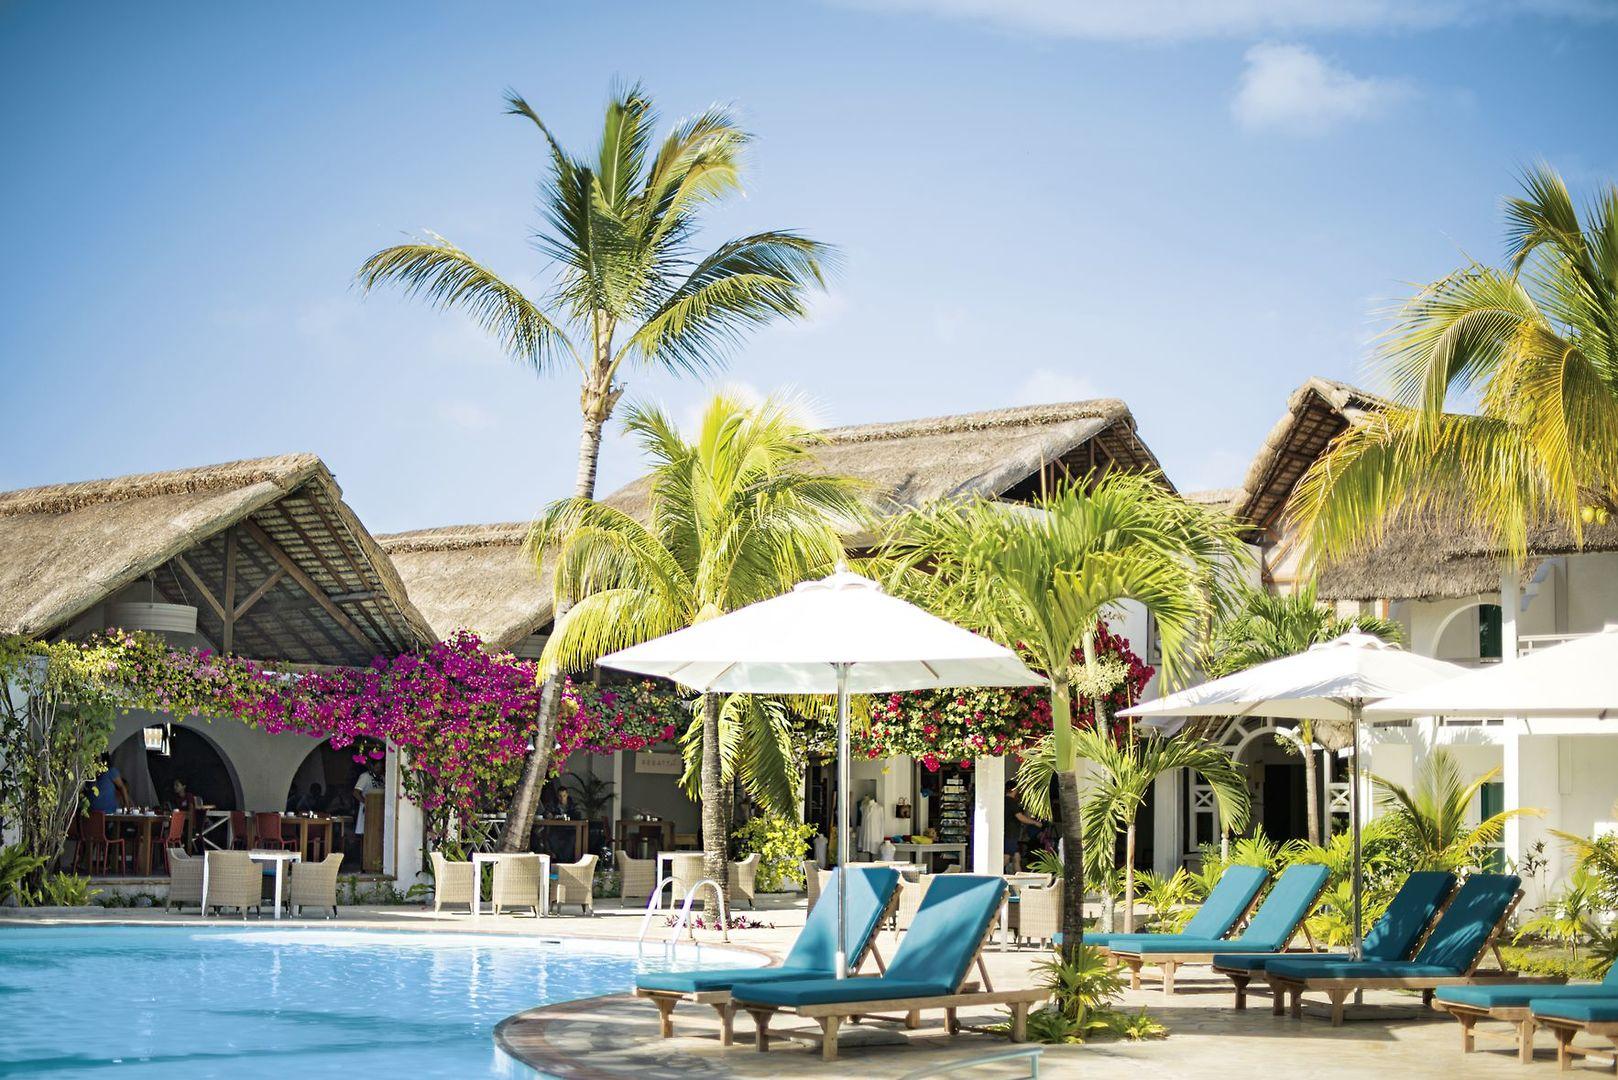 Veranda Palmar Beach Hotel and Spa